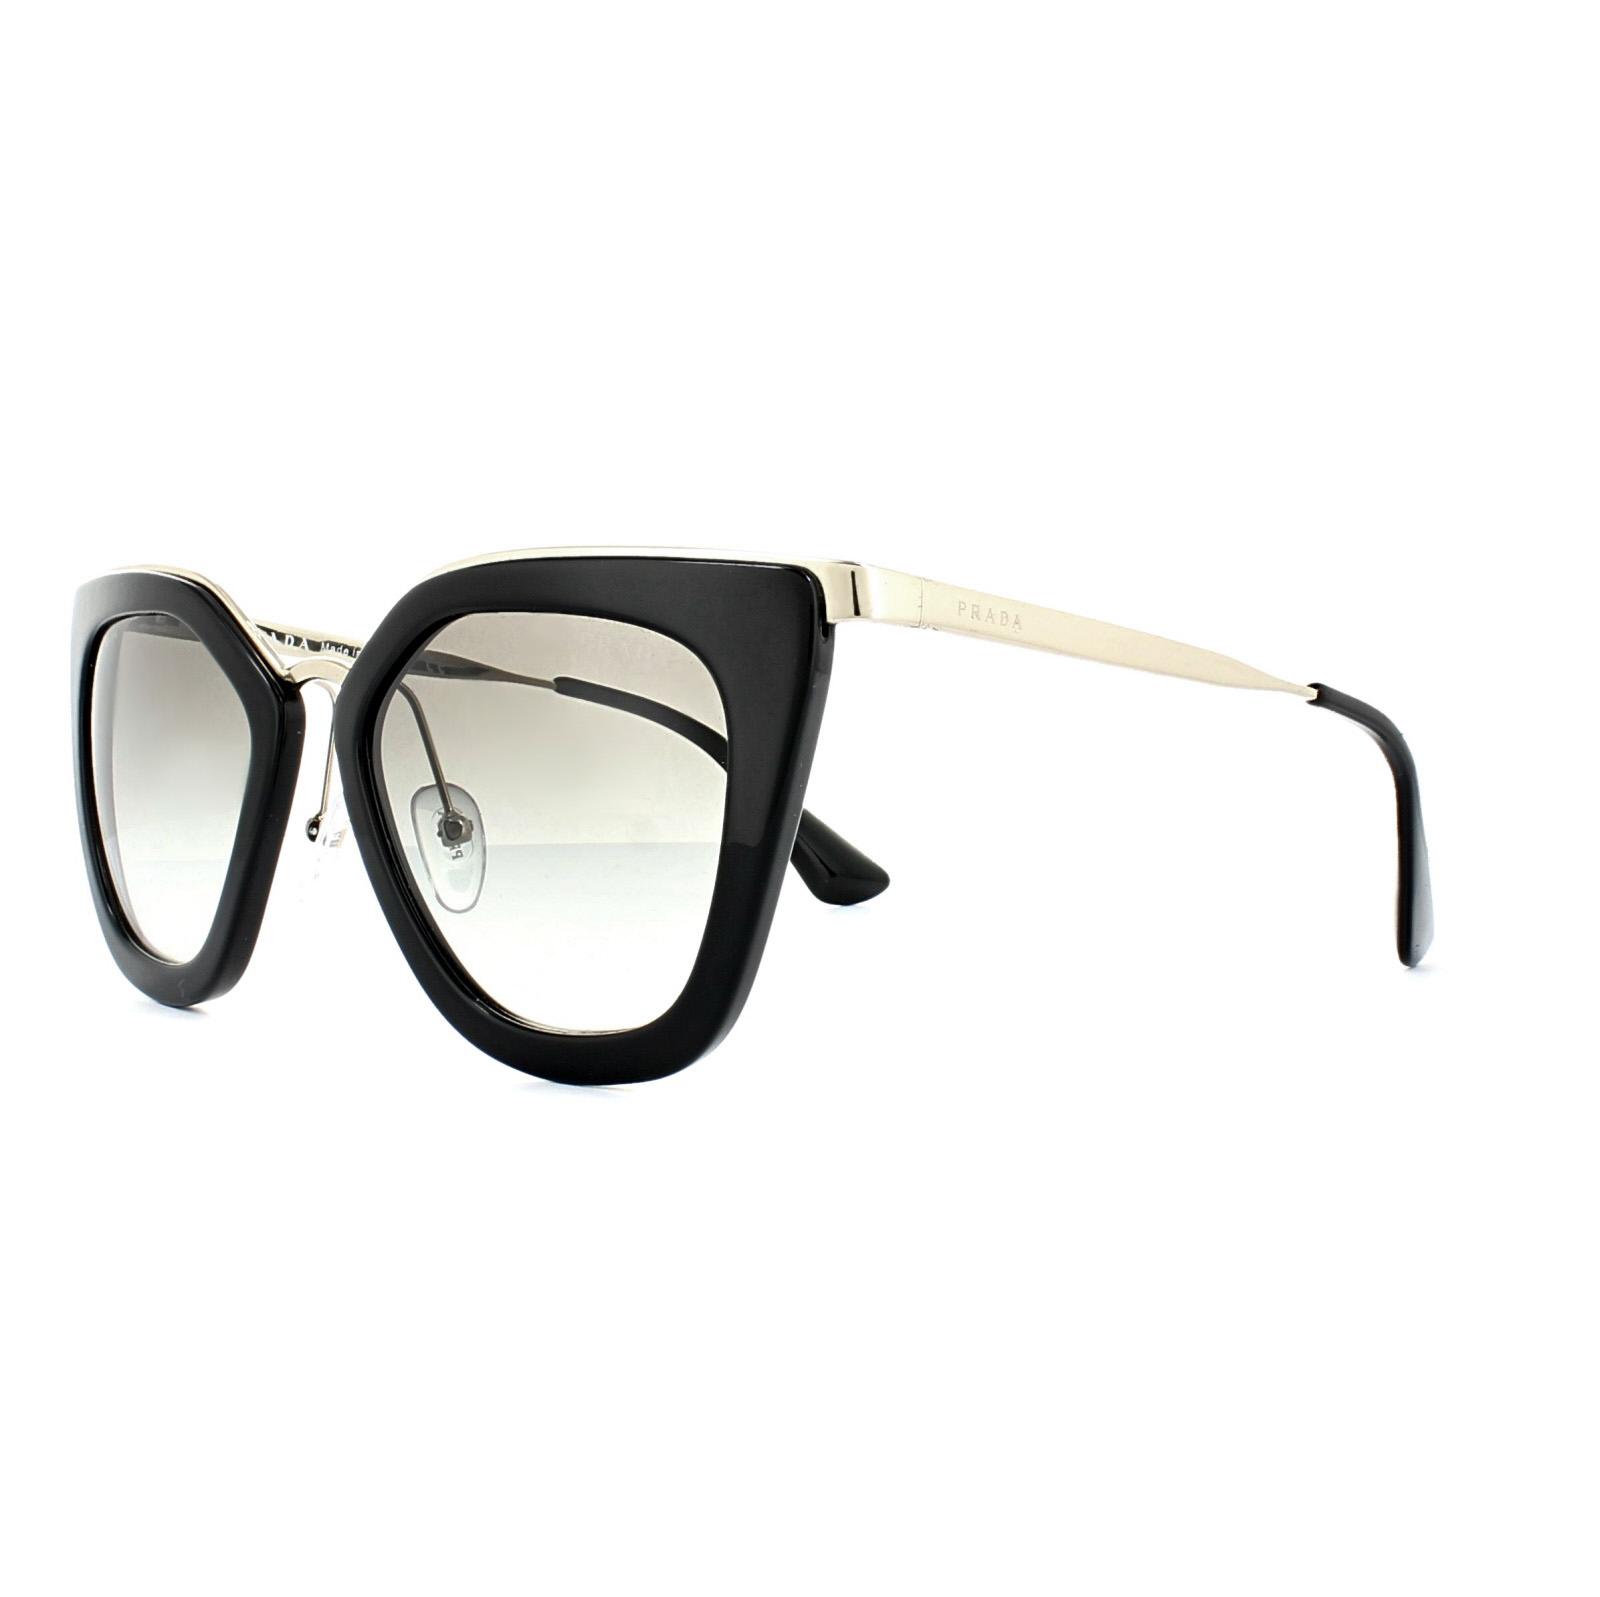 PRADA Prada Damen Sonnenbrille » PR 53SS«, schwarz, 1AB0A7 - schwarz/grau